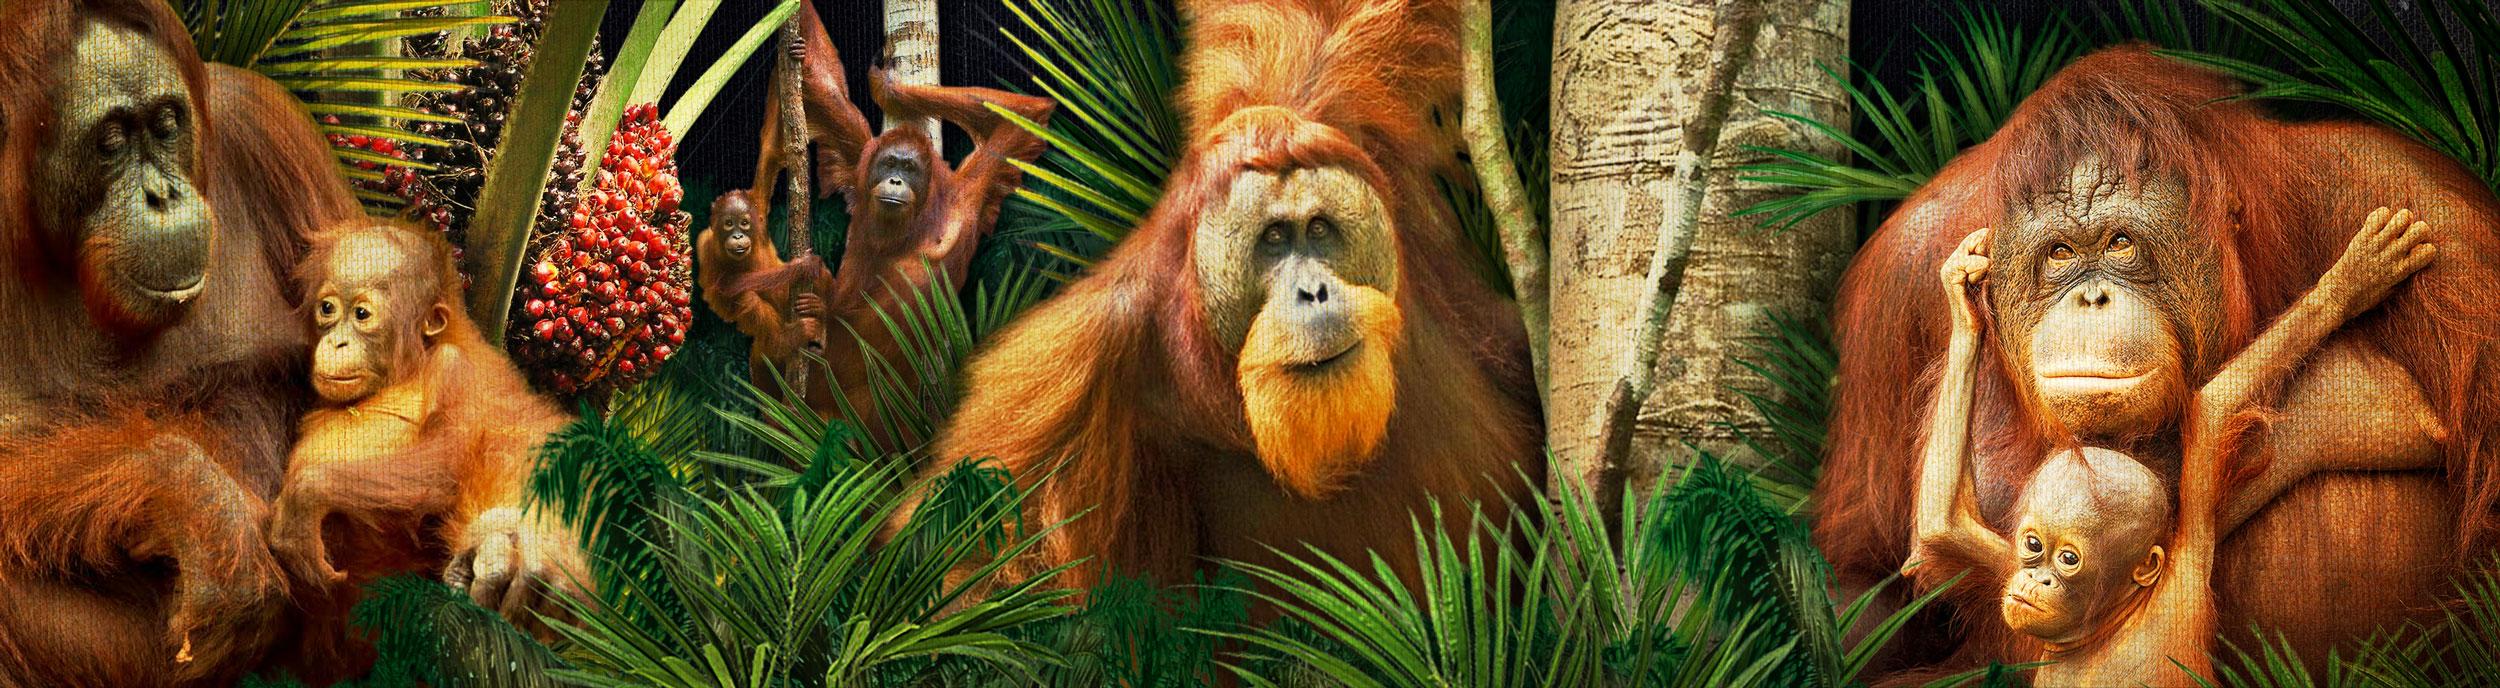 OrangutanSlideXXL